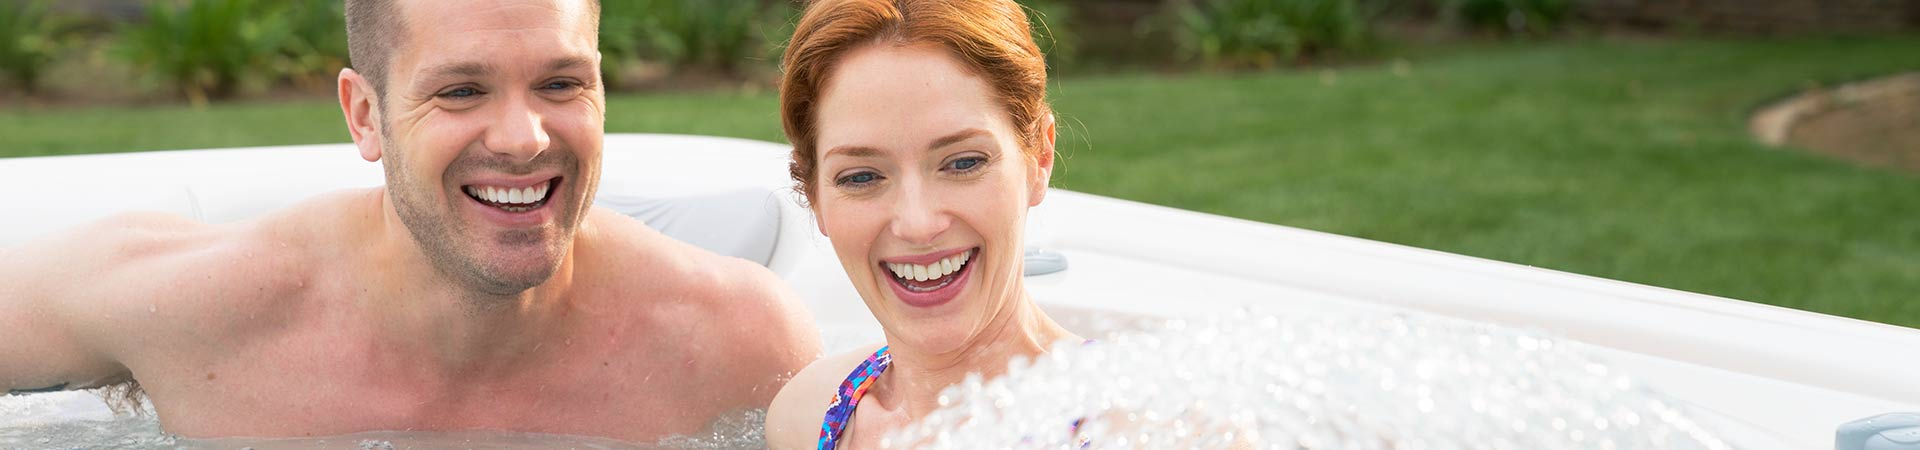 Explore the Hidden Benefits of Hot Tubs, Cottonwood Portable Spas